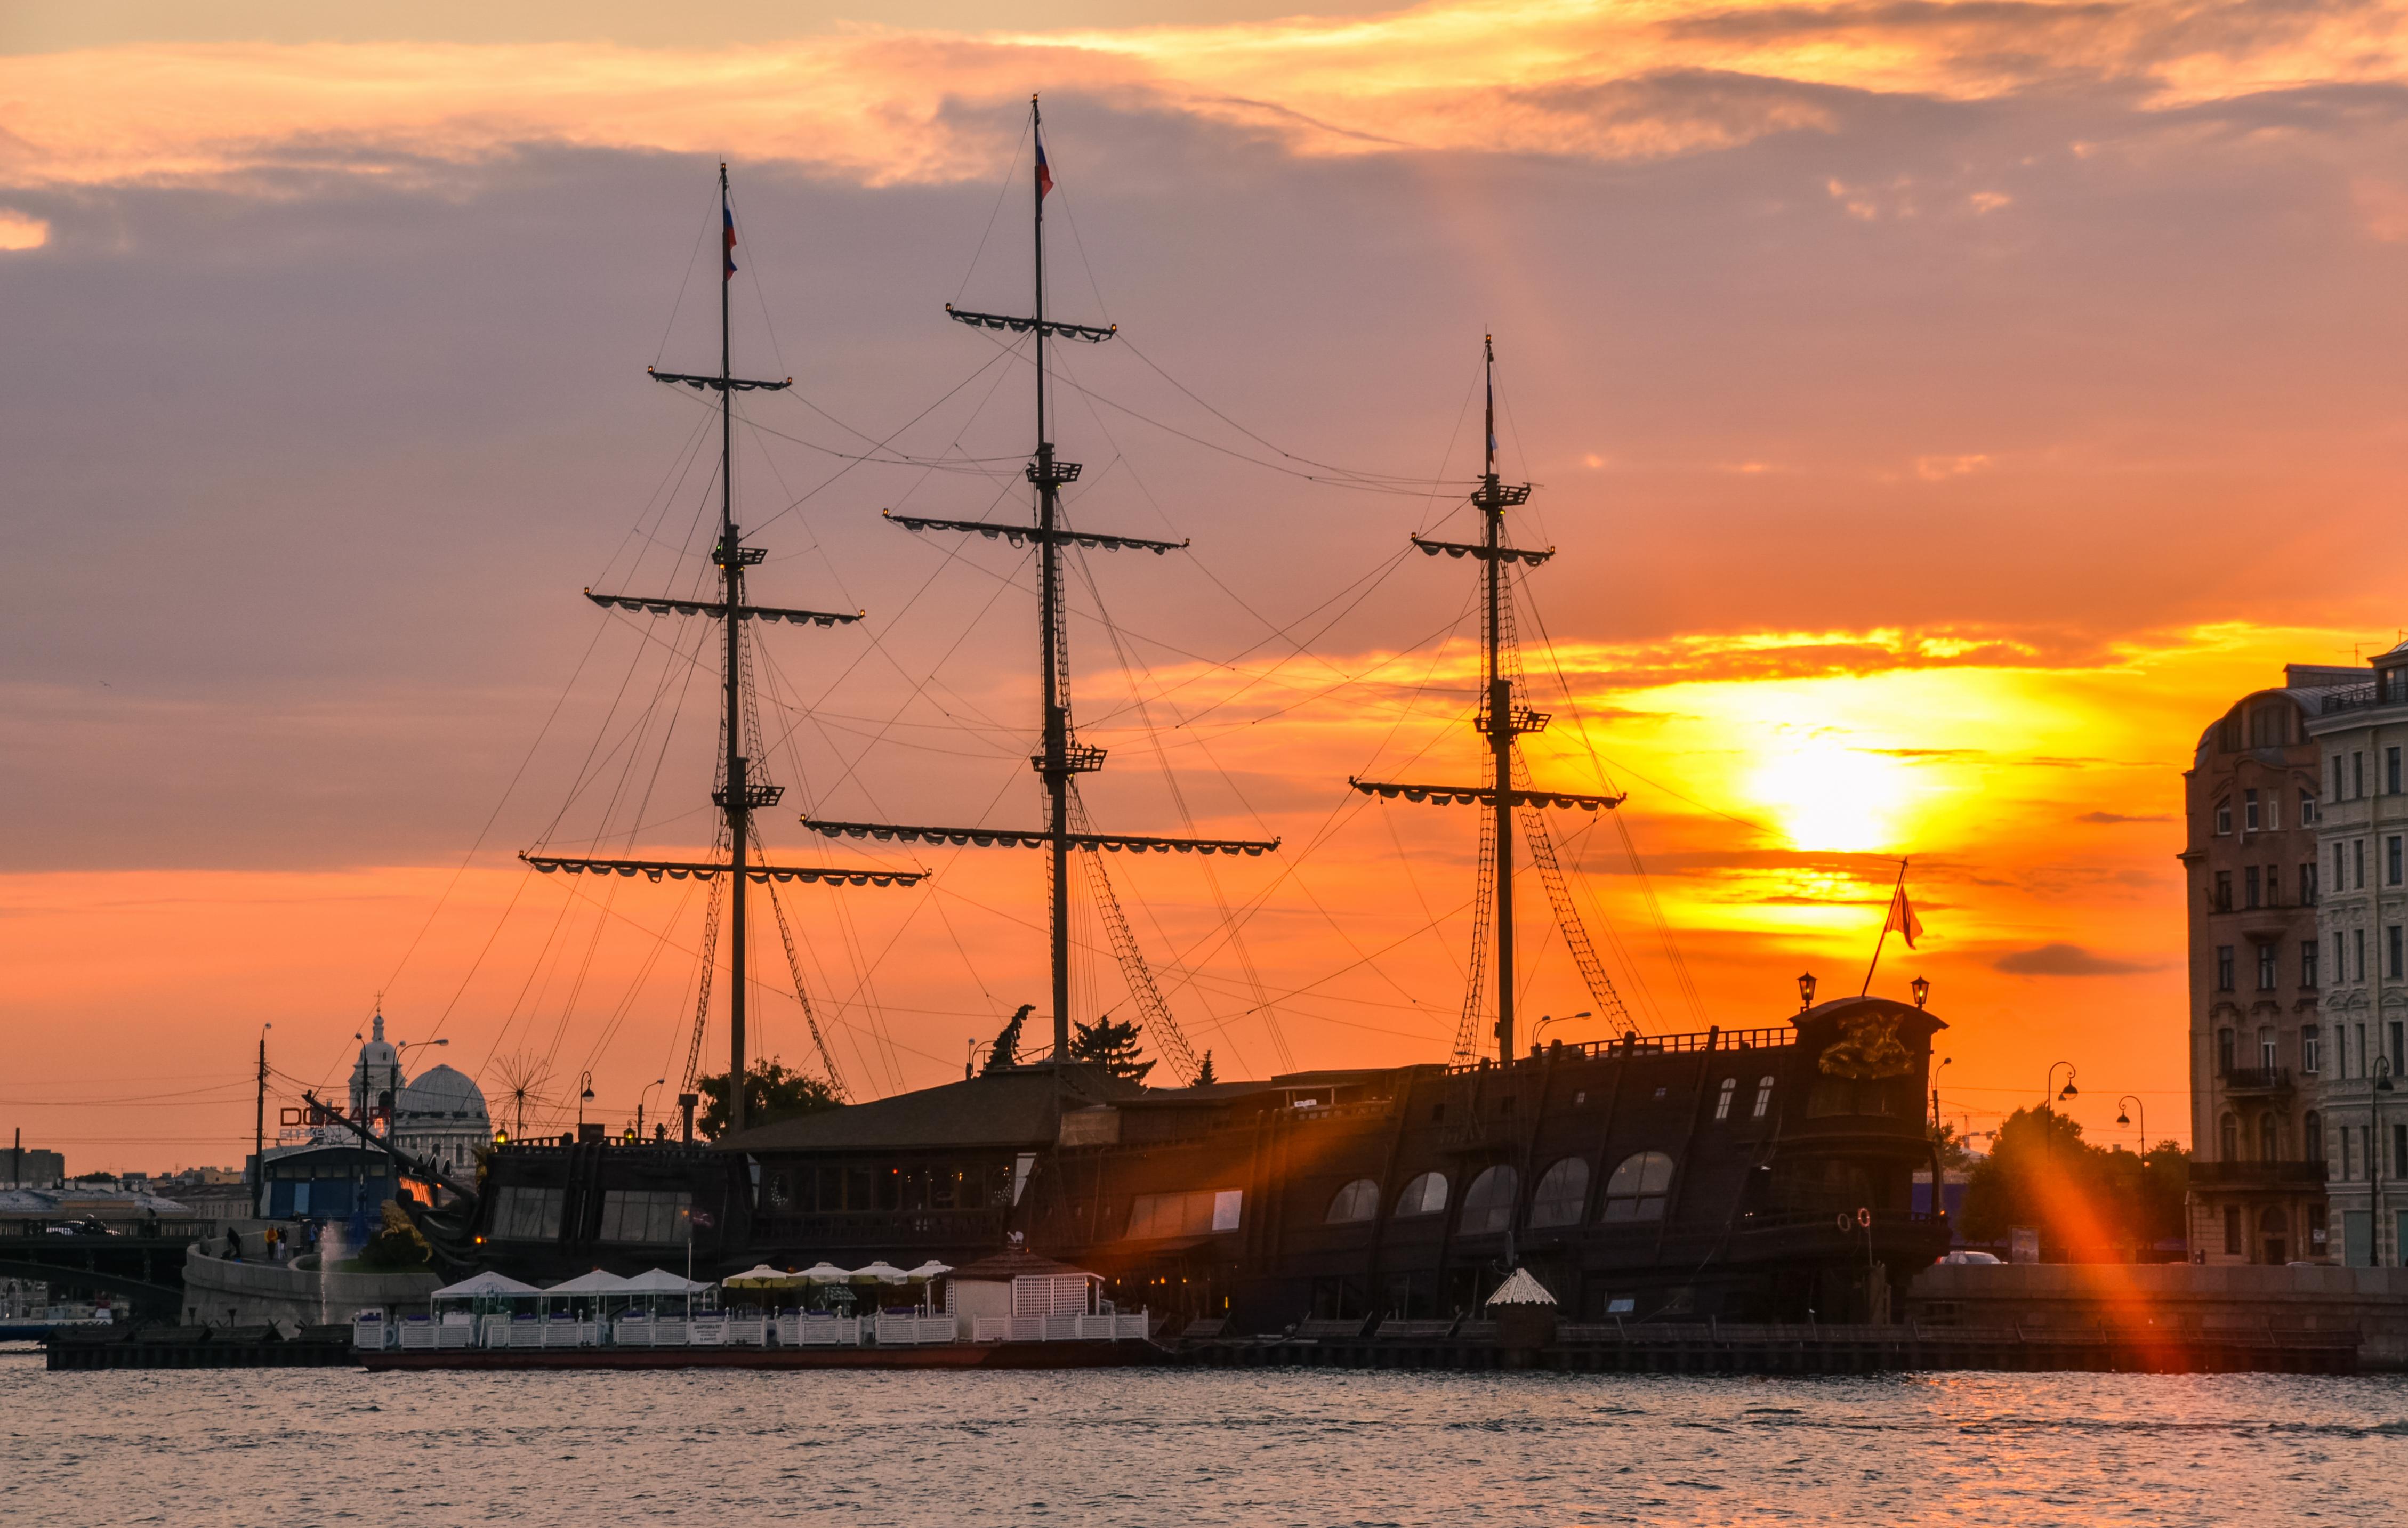 Sun setting over Saint Petersburg